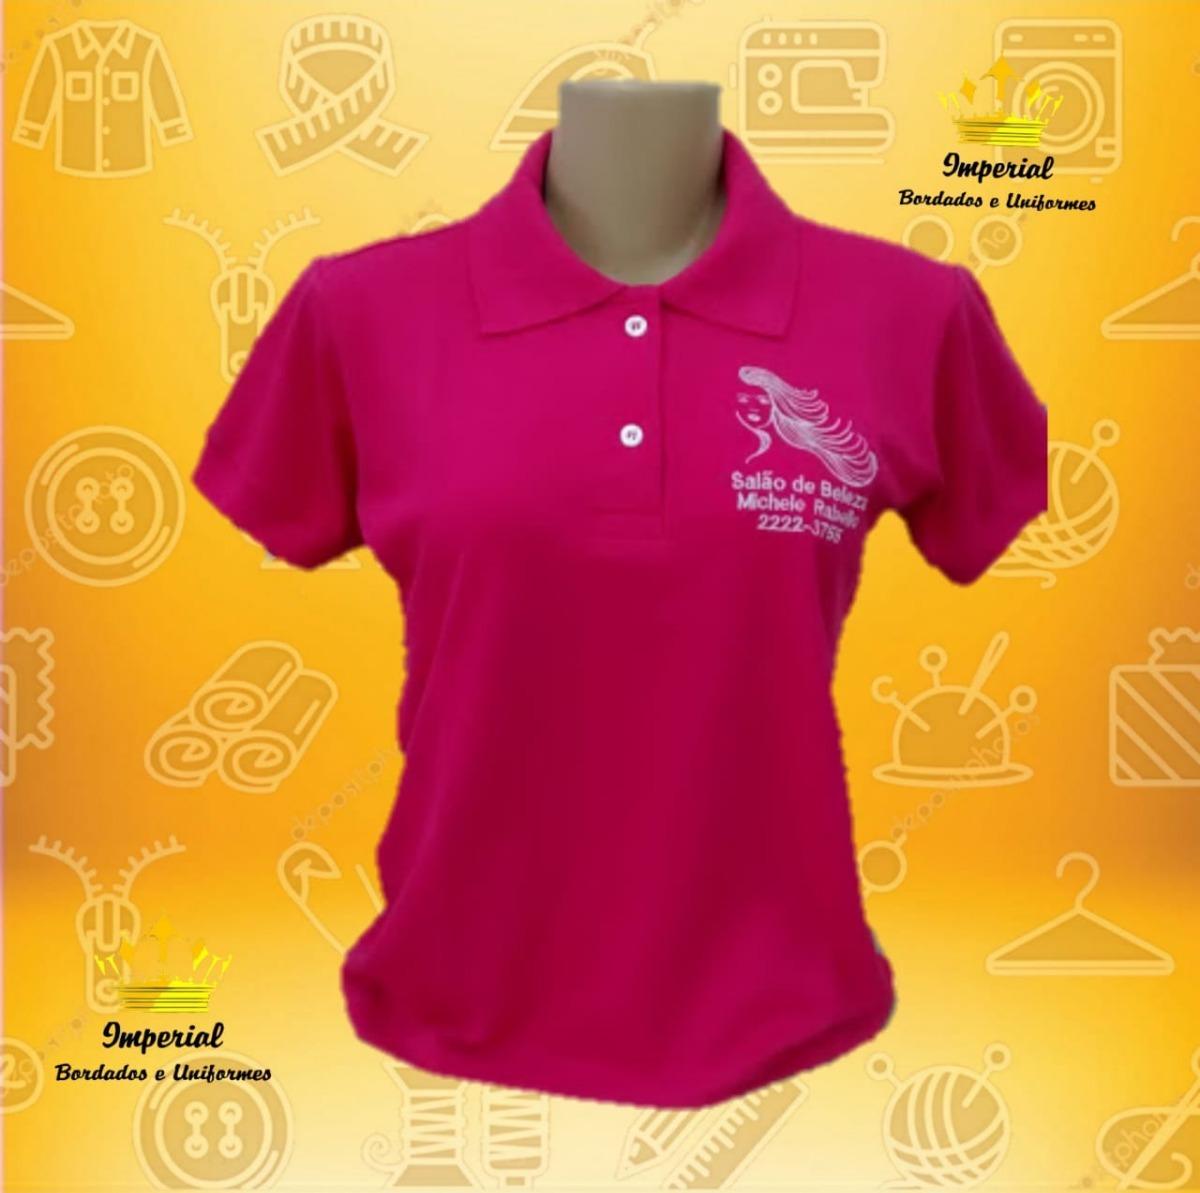 d3301244a5 kit 01 camisa polo personalizada. Carregando zoom.